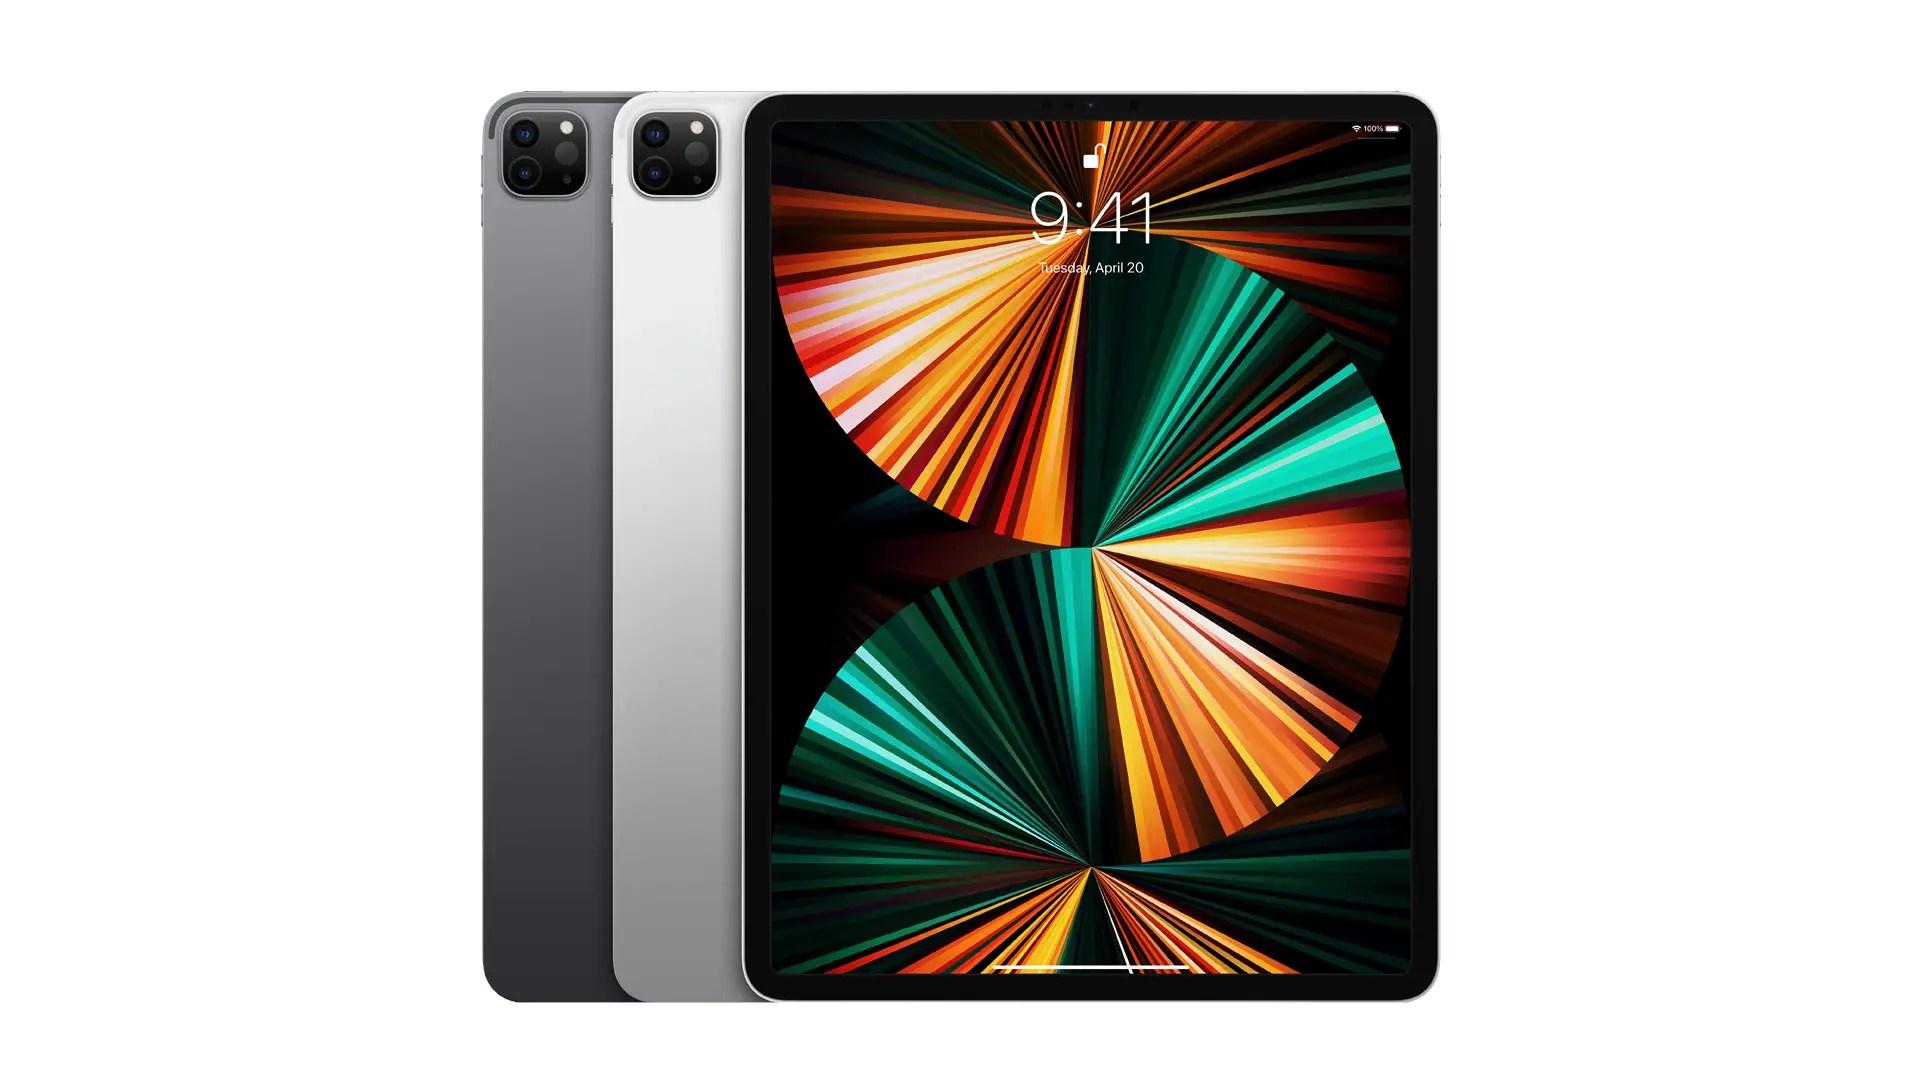 iPad Pro 12.9-inch 2021